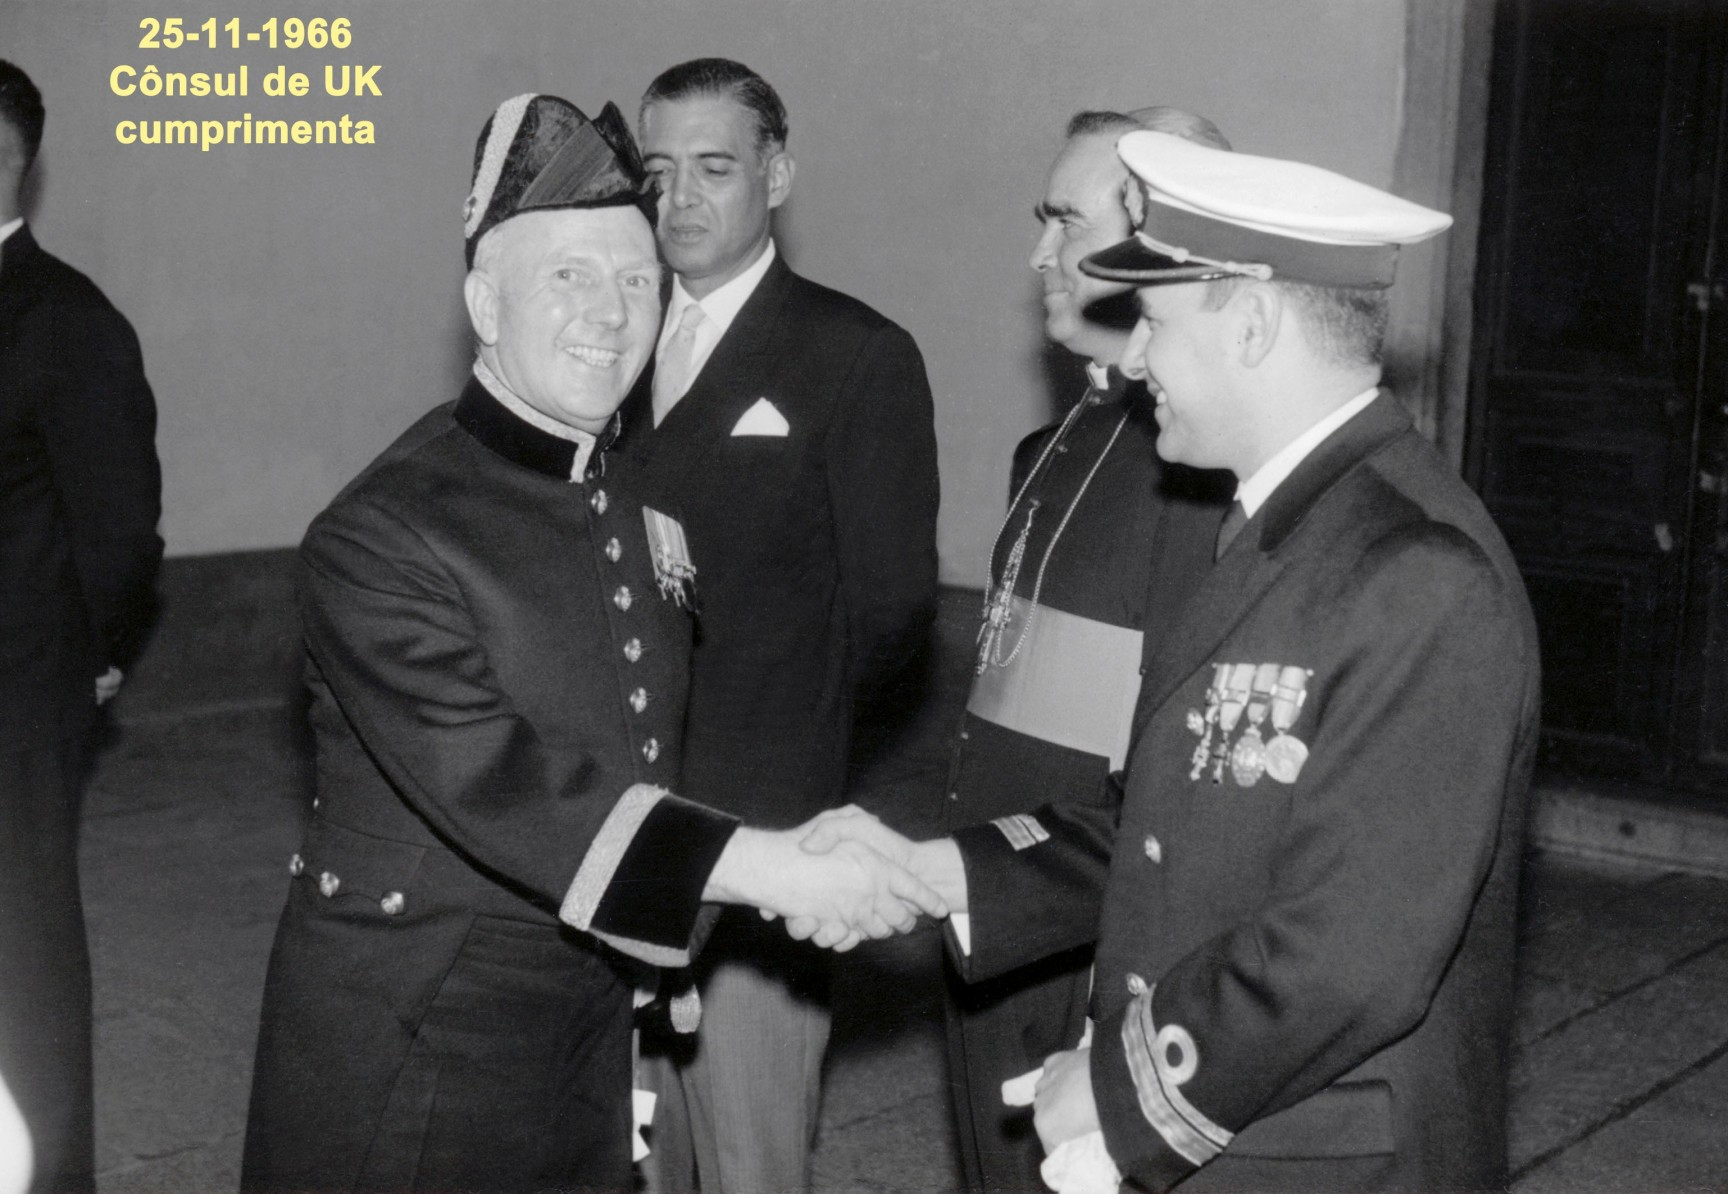 060 66-11-25 cônsul de UK cumprimenta Nunes da Silva